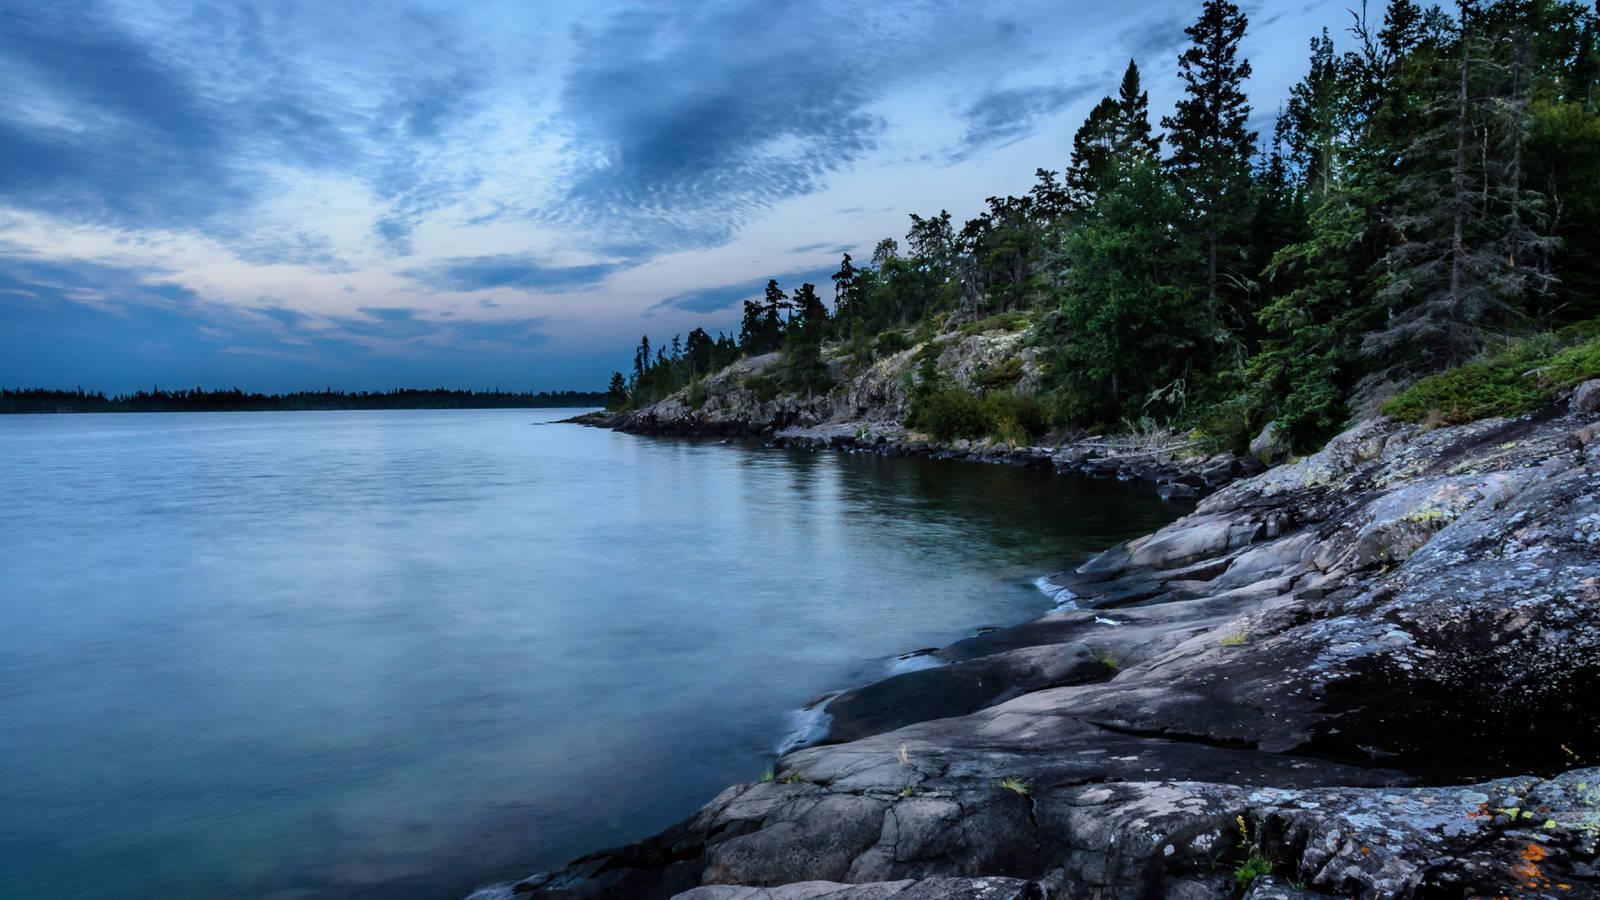 4k Fall Michigan Wallpaper Isle Royale 183 National Parks Conservation Association